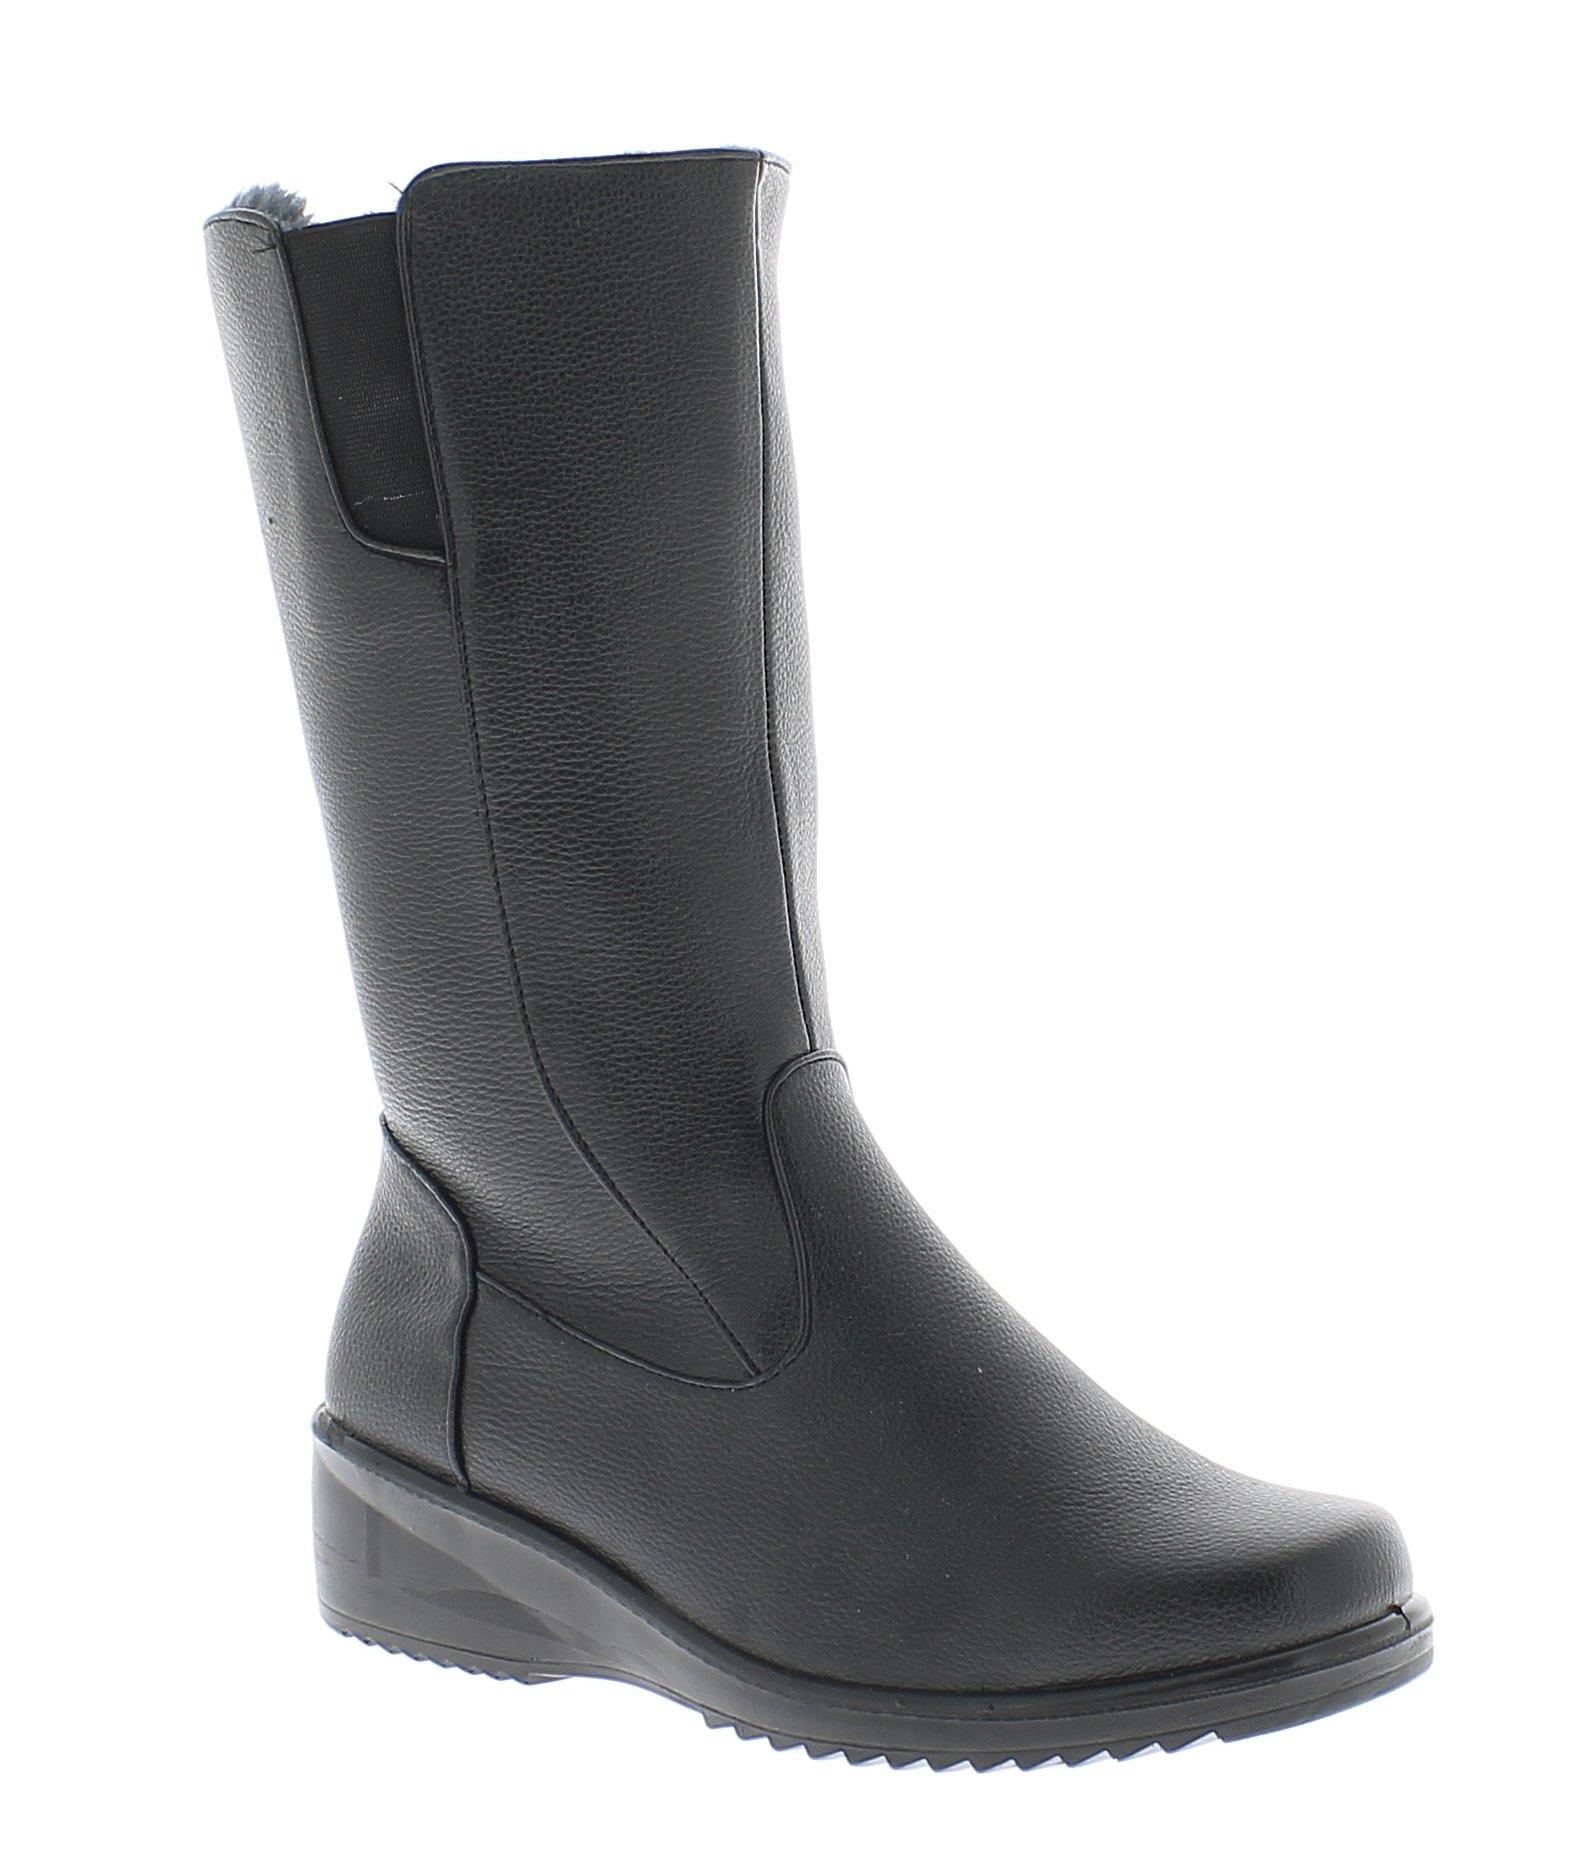 ANTRIN Γυναικεία Μπότα BARBARA-110 Μαύρο - IqShoes - BARBARA-110 BLACK -black-38 παπούτσια  γυναικεία μποτάκια